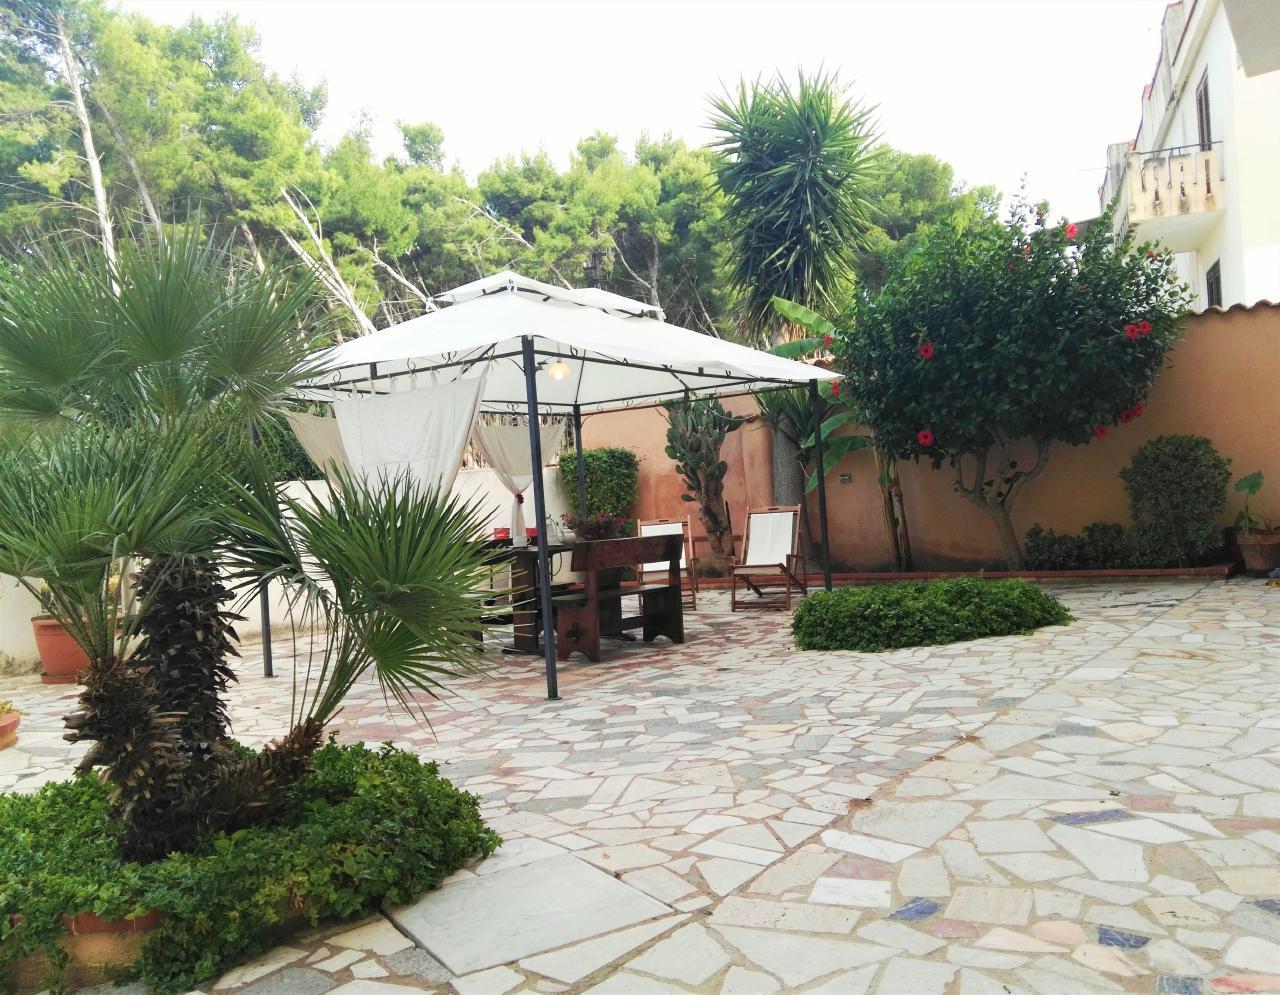 Maison de vacances Castellammare del Golfo Villalba A (34542), Castellammare del Golfo, Trapani, Sicile, Italie, image 2